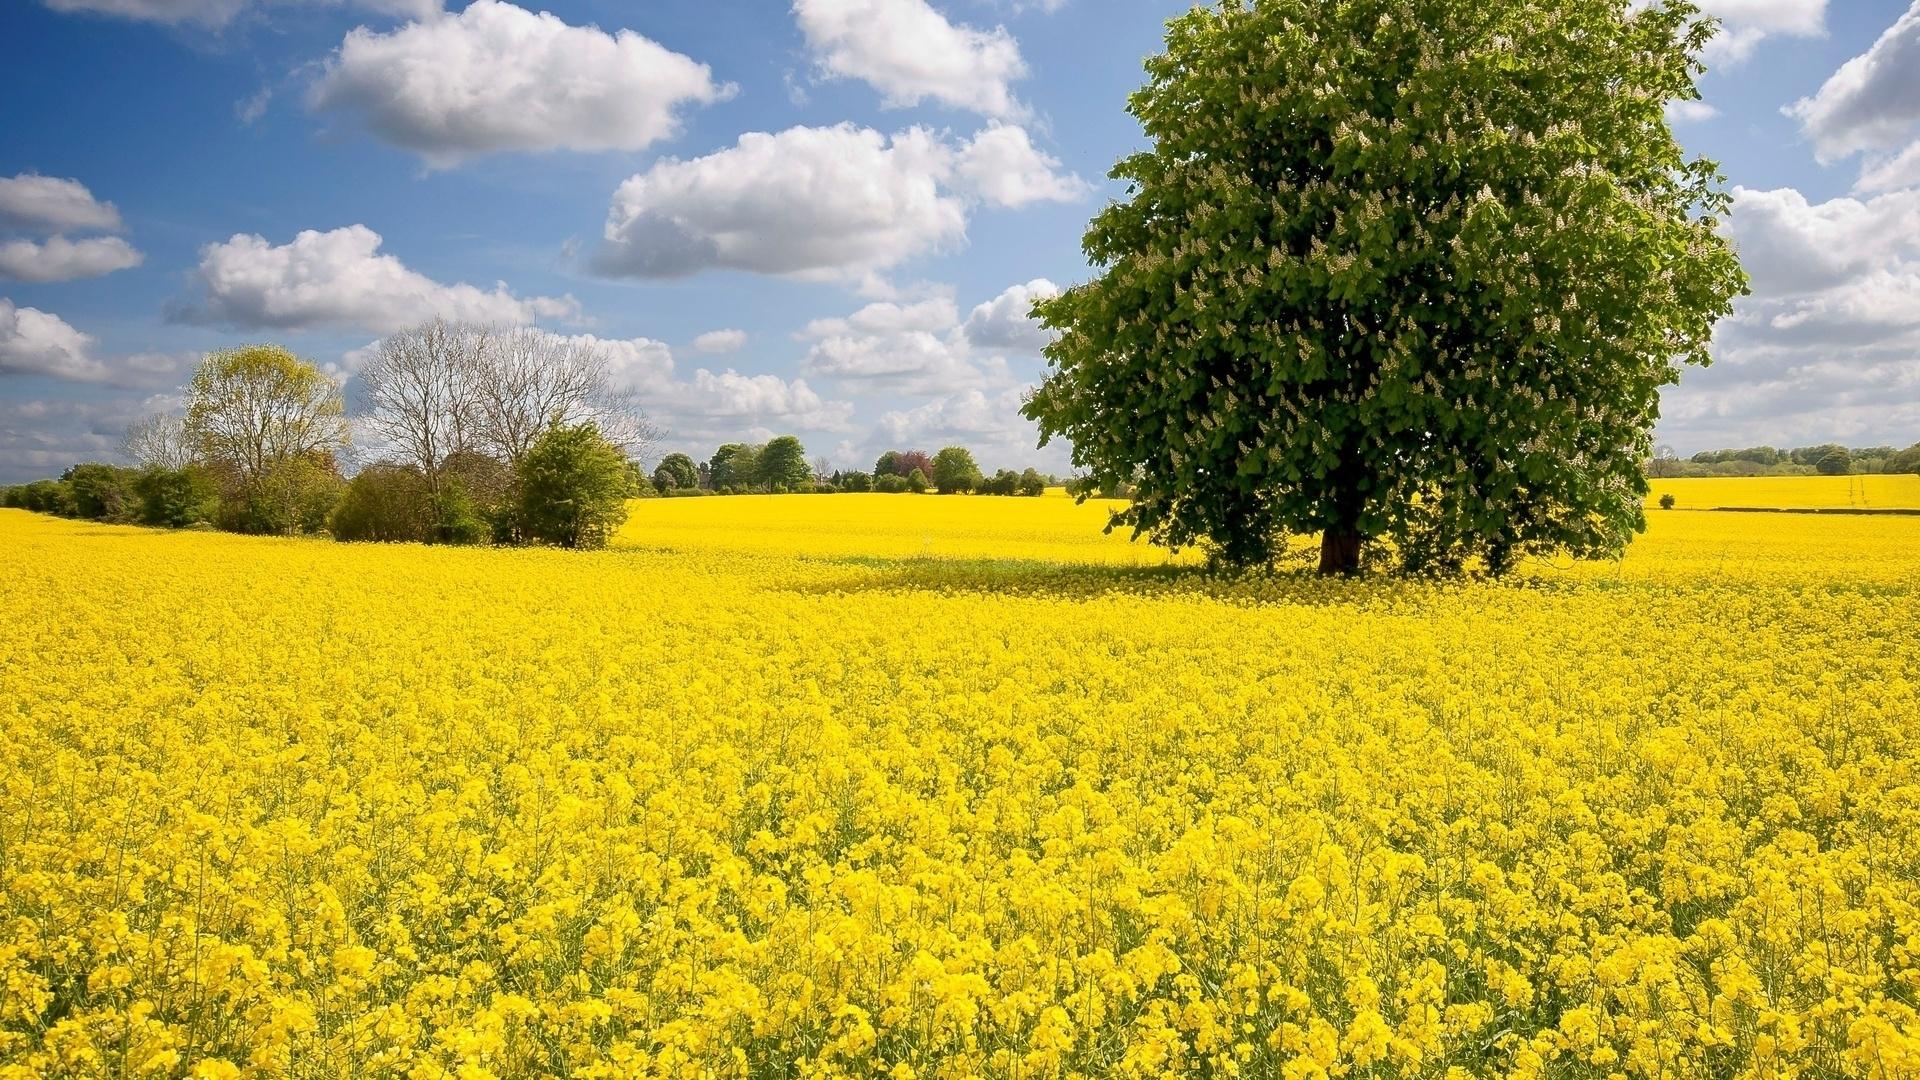 Yellow Nature desktop background